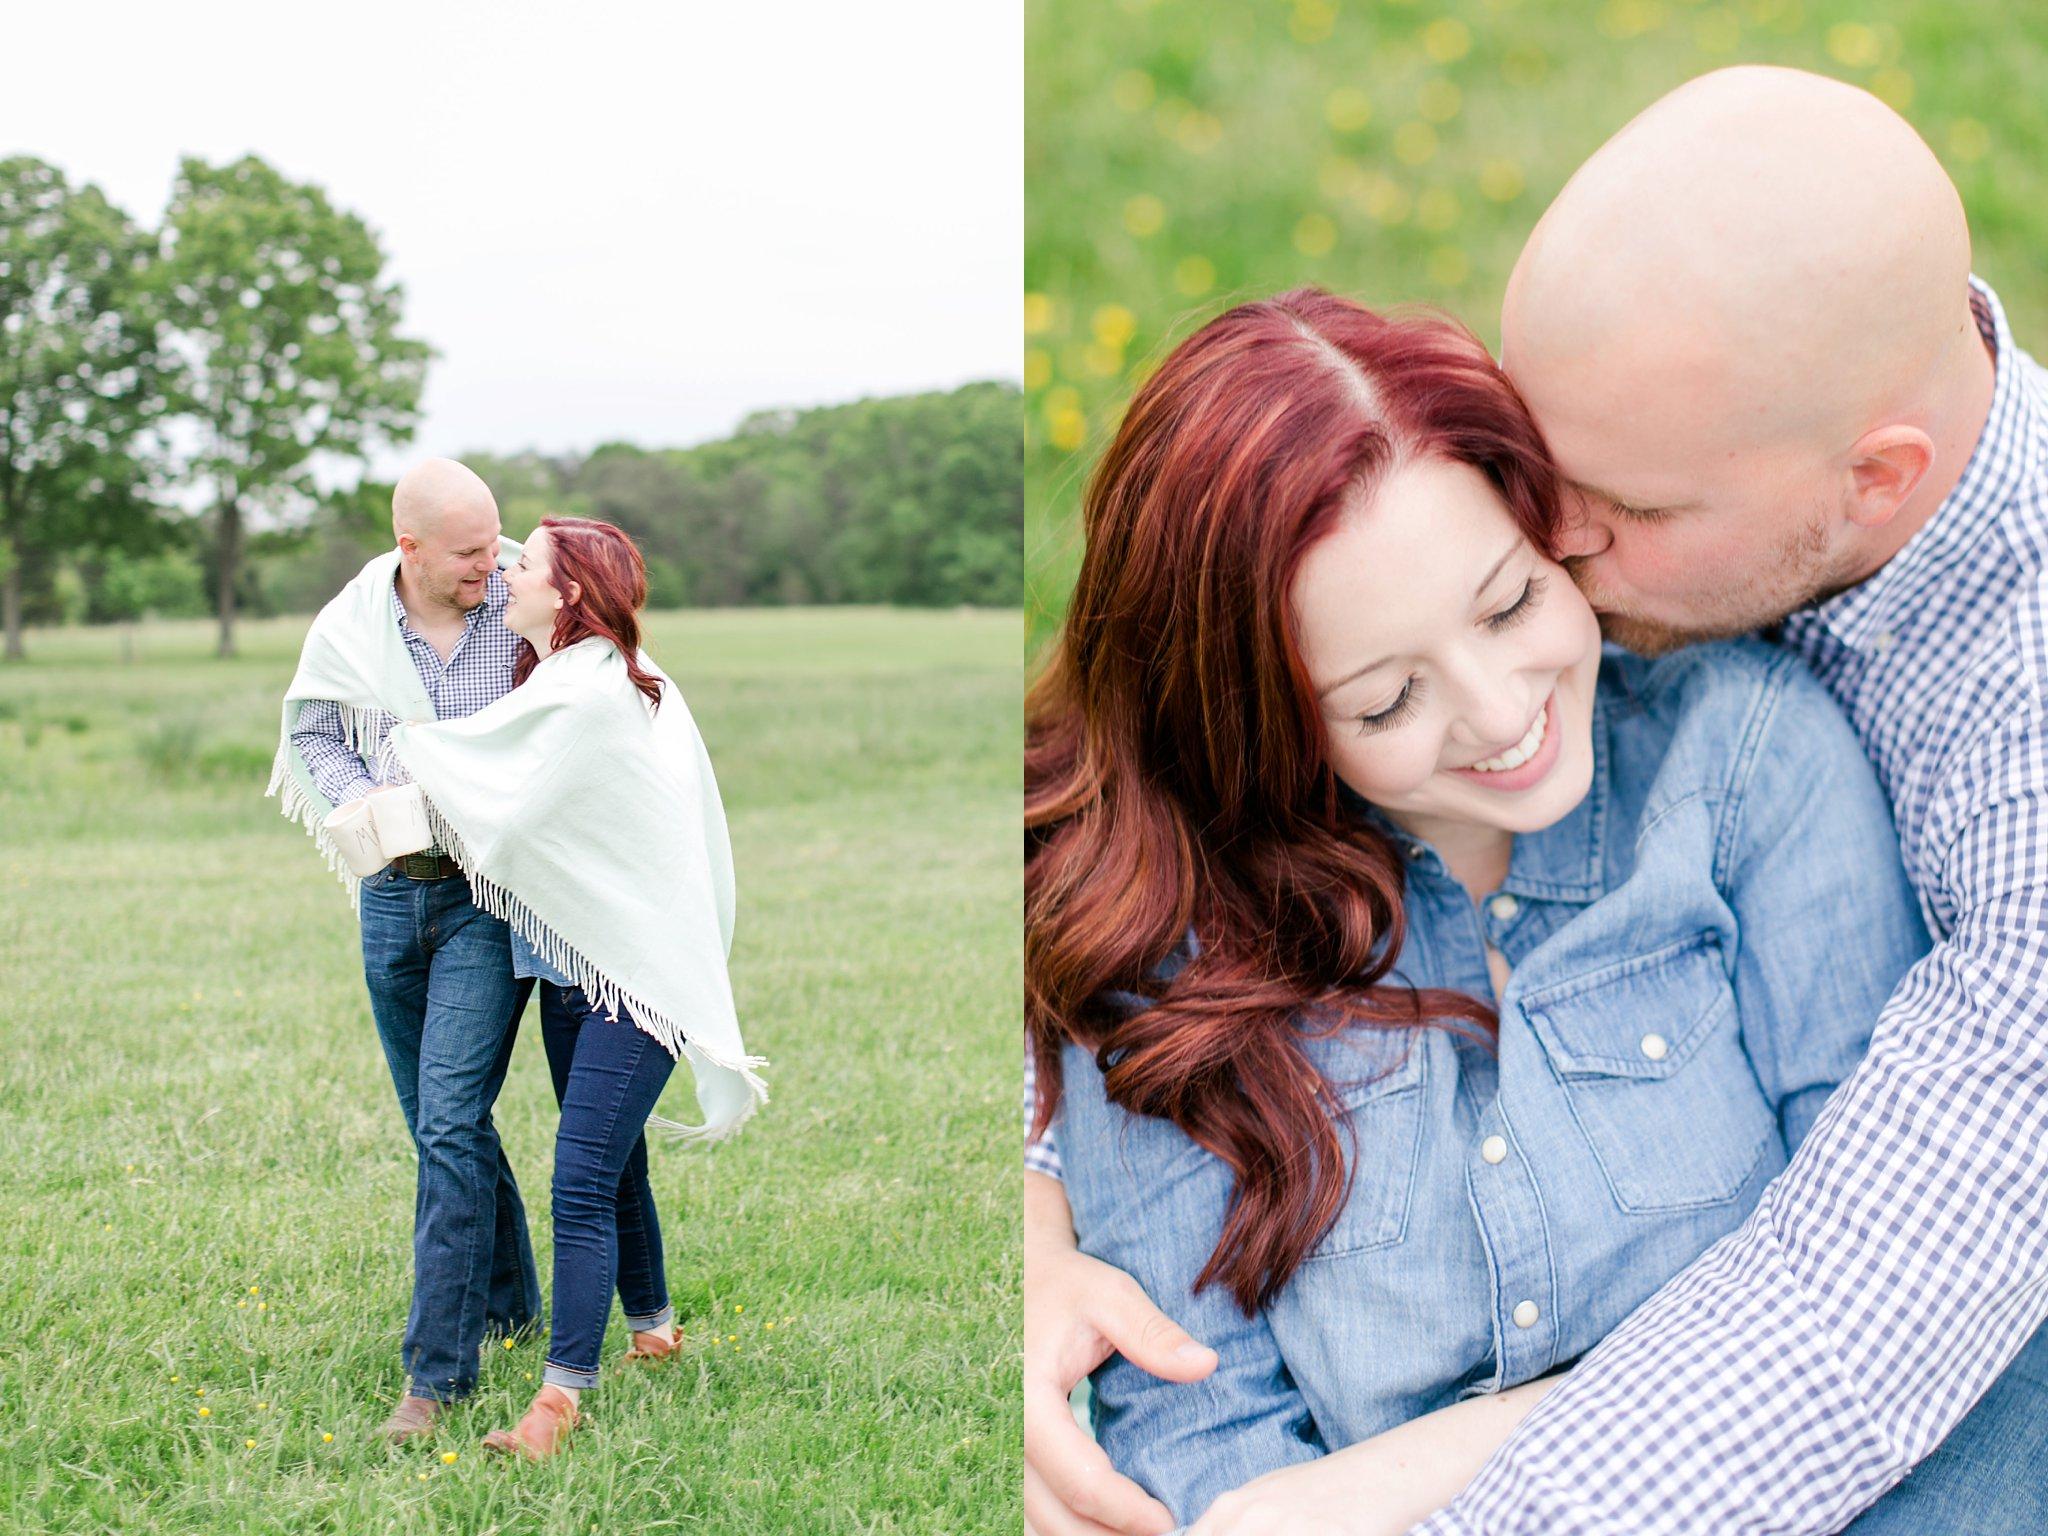 Old Town Manassas Battlefield Engagement Photos Virginia Wedding Photographer Jessica & Jason-142.jpg